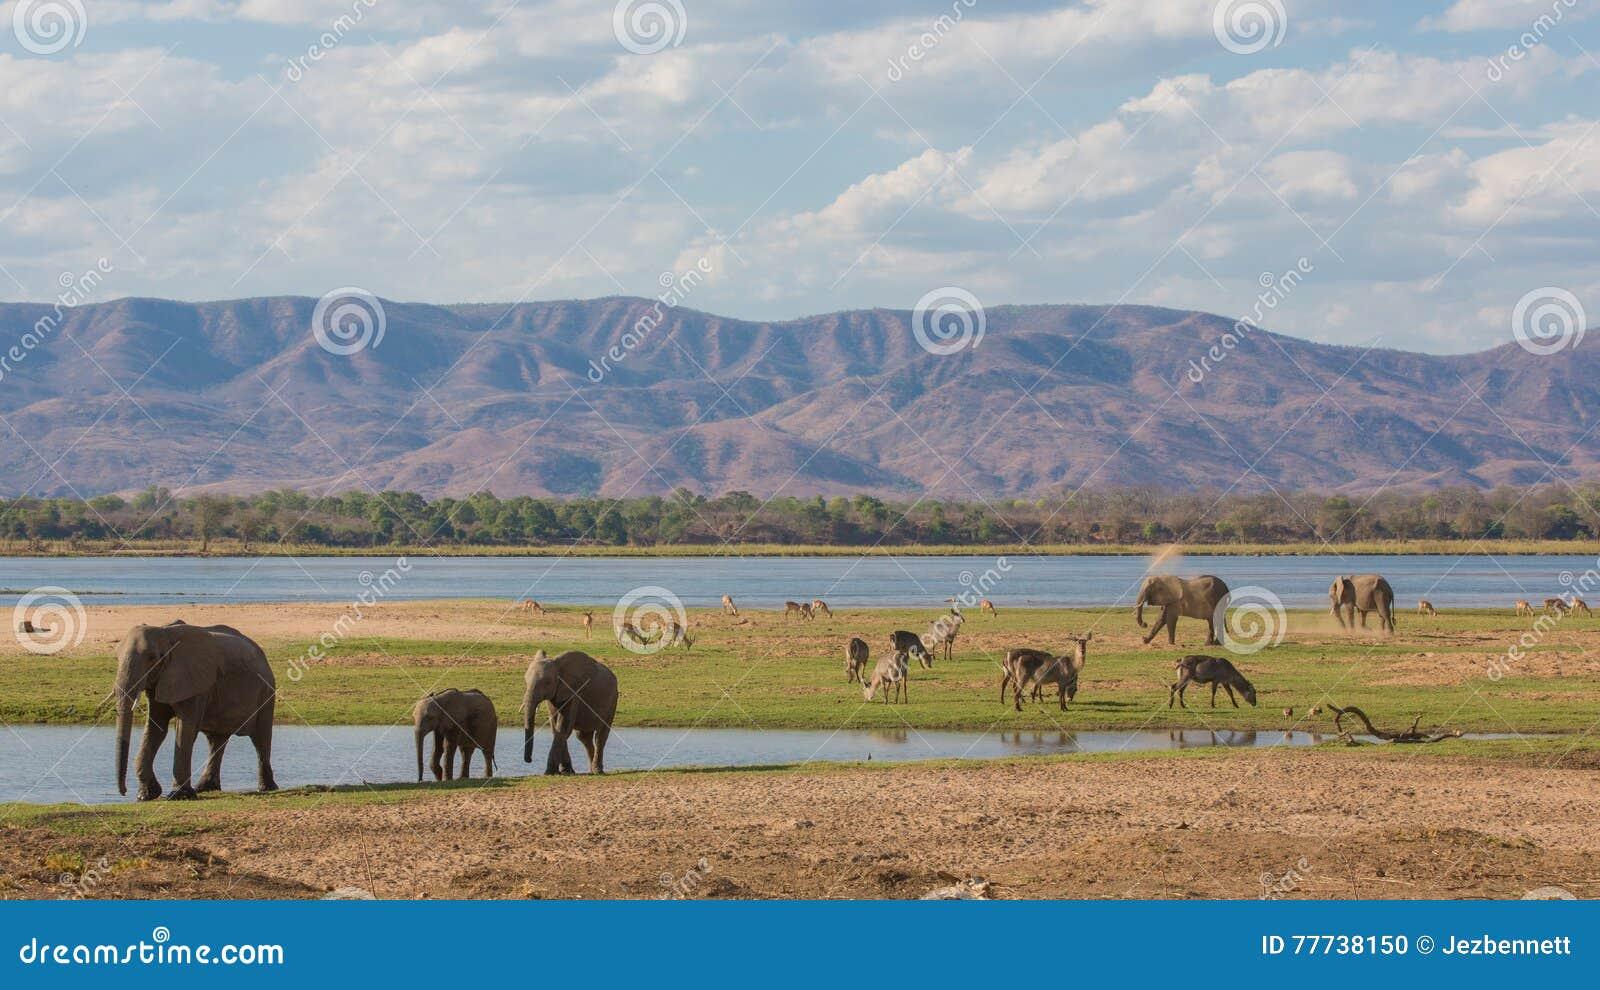 Wildlife on the Zambezi river